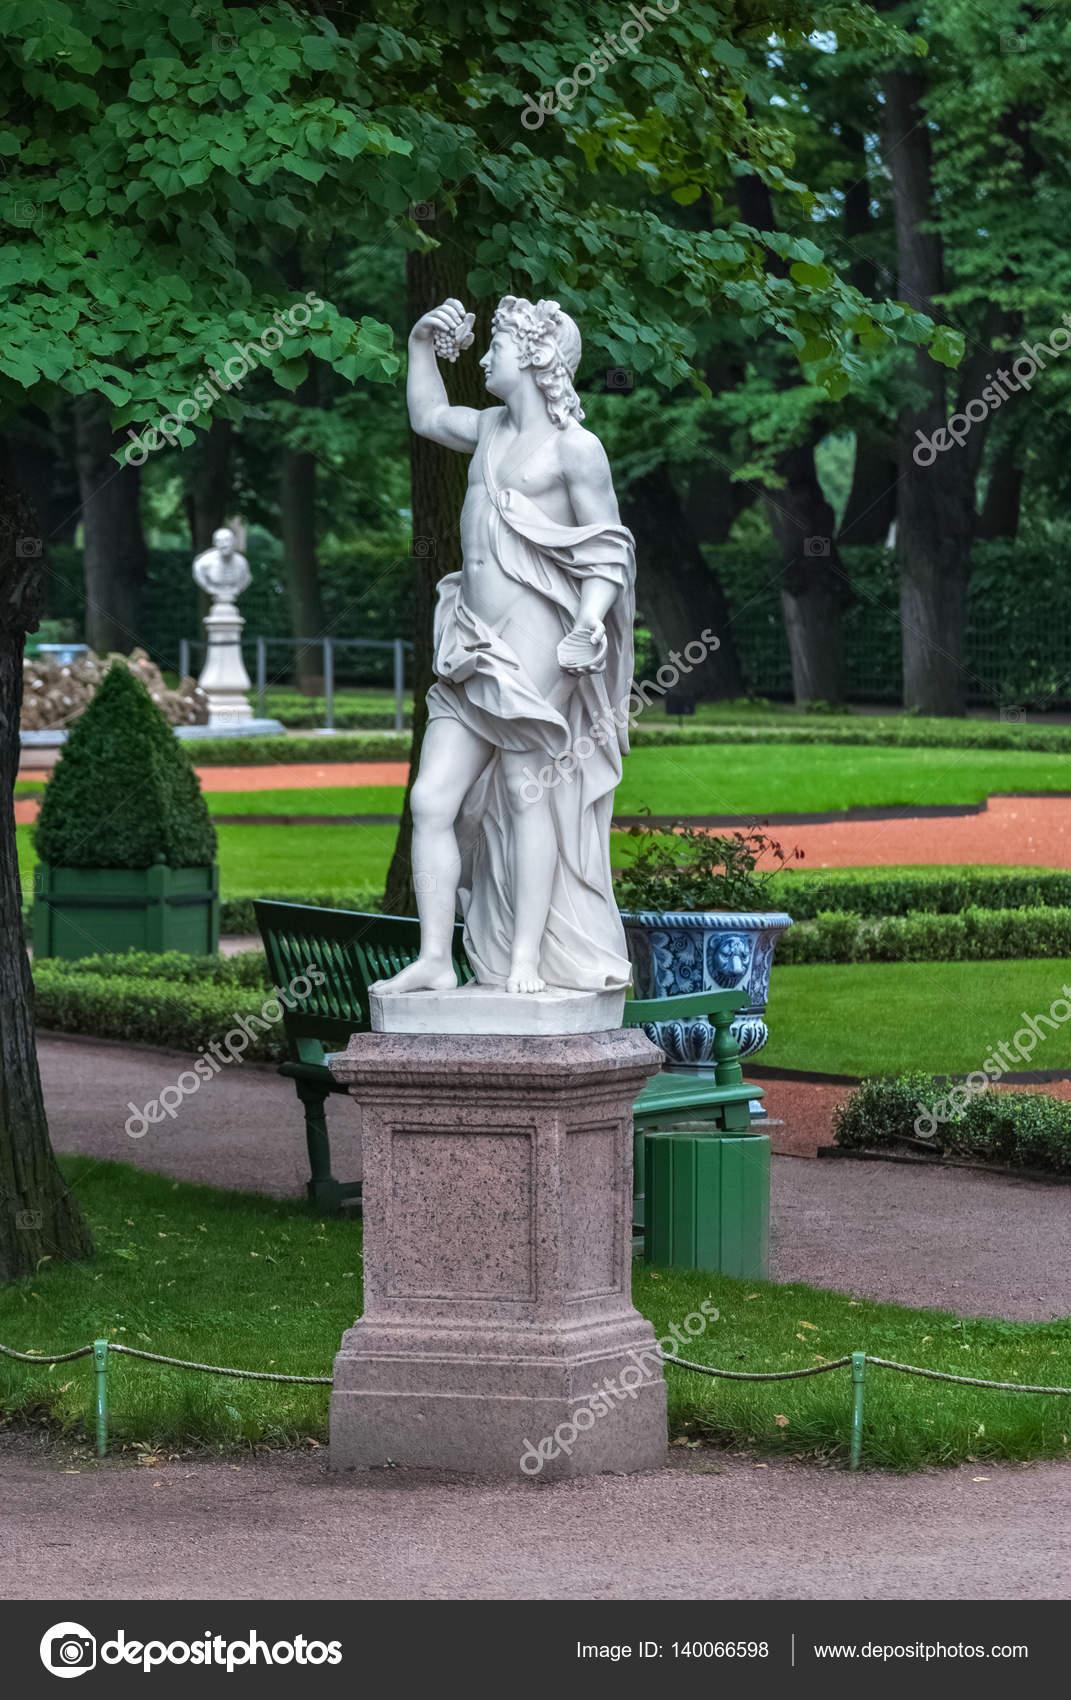 Imagenes De Esculturas De Jardin La Escultura En El Jardin De - Escultura-jardin